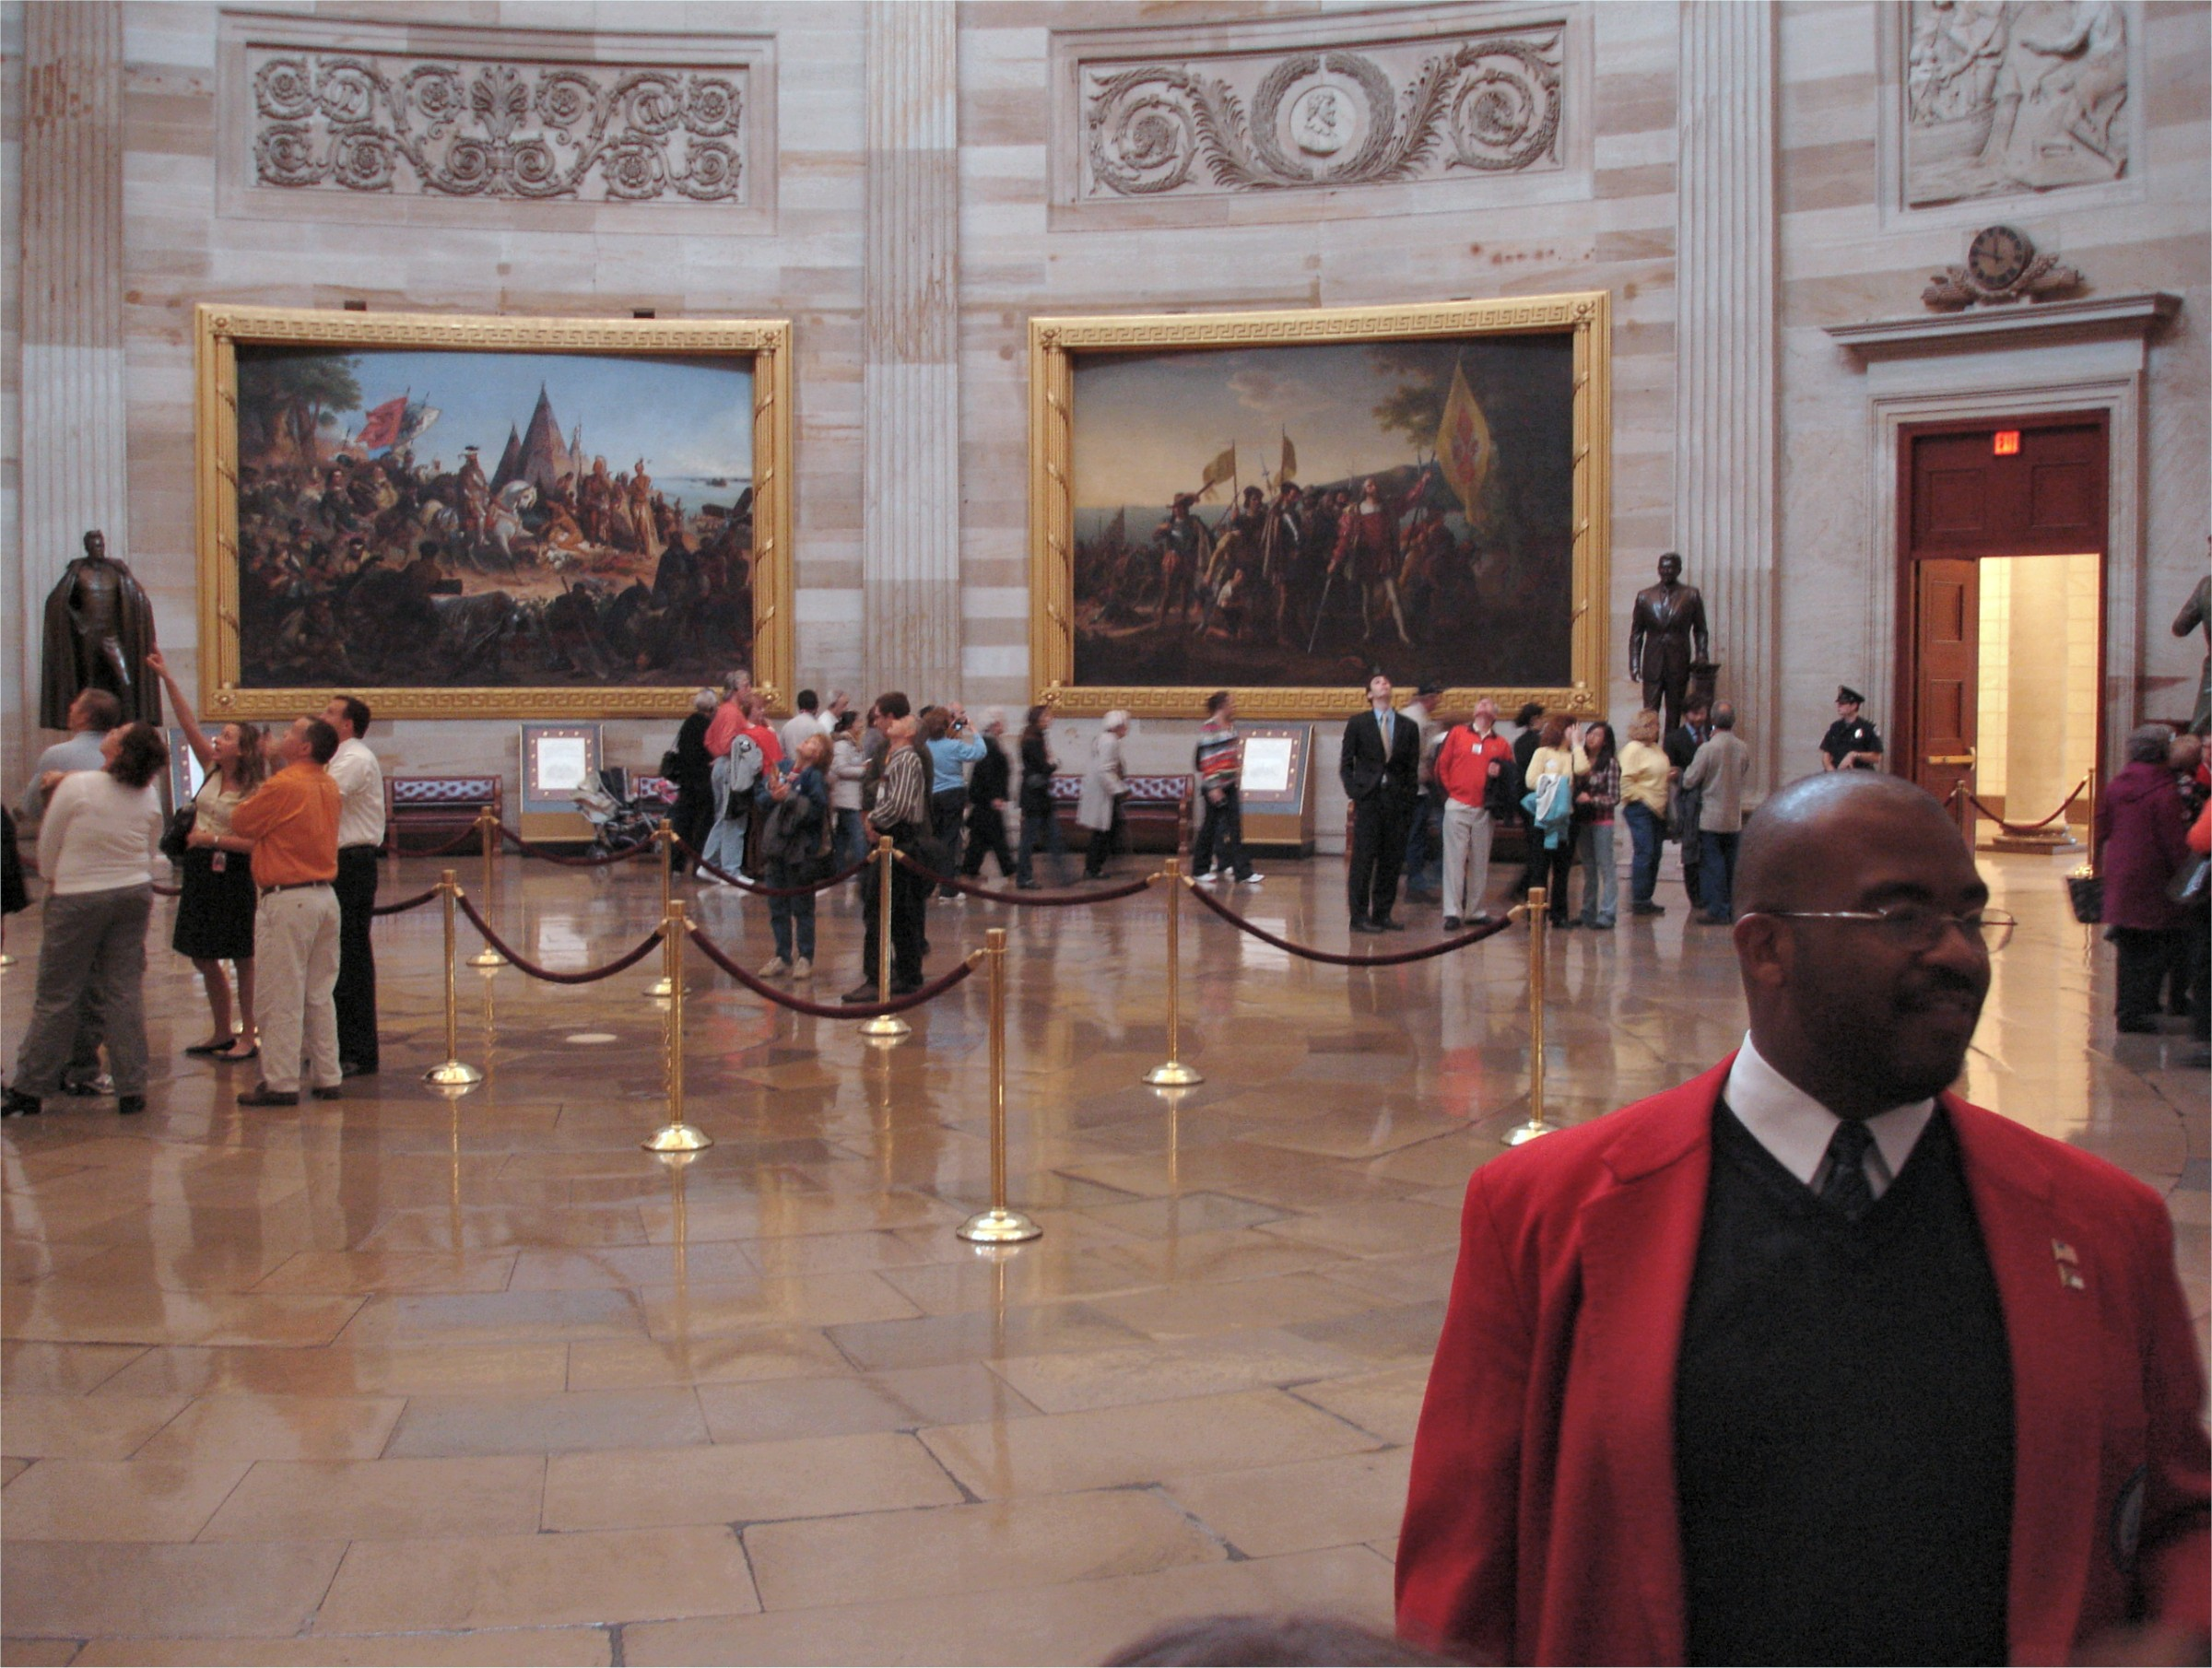 A tour guide in red blazer describing the rotunda's art and.